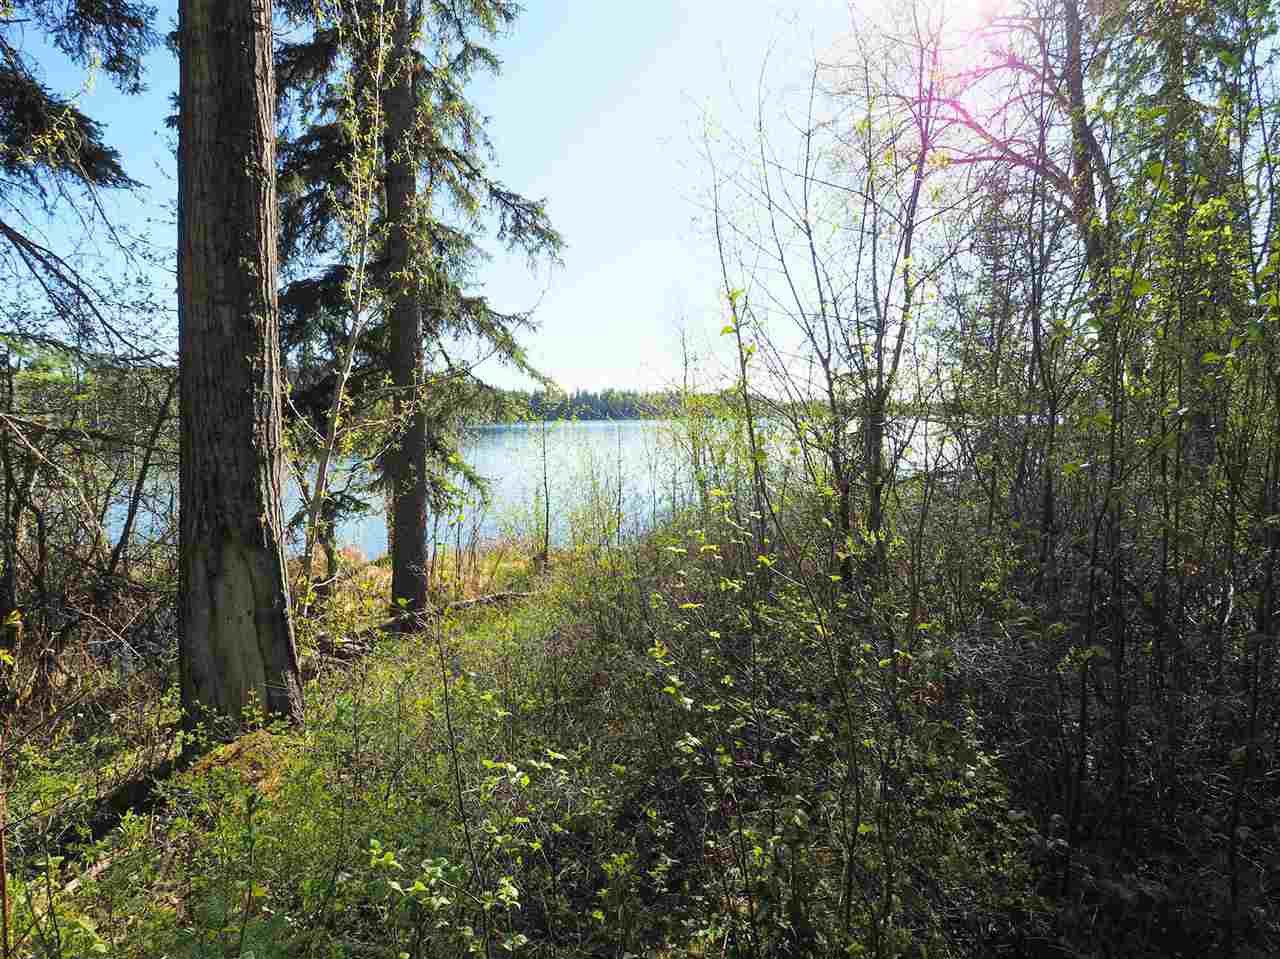 Main Photo: LOT B N BRIDGE LAKE Road in Bridge Lake: Bridge Lake/Sheridan Lake Land for sale (100 Mile House (Zone 10))  : MLS®# R2456076